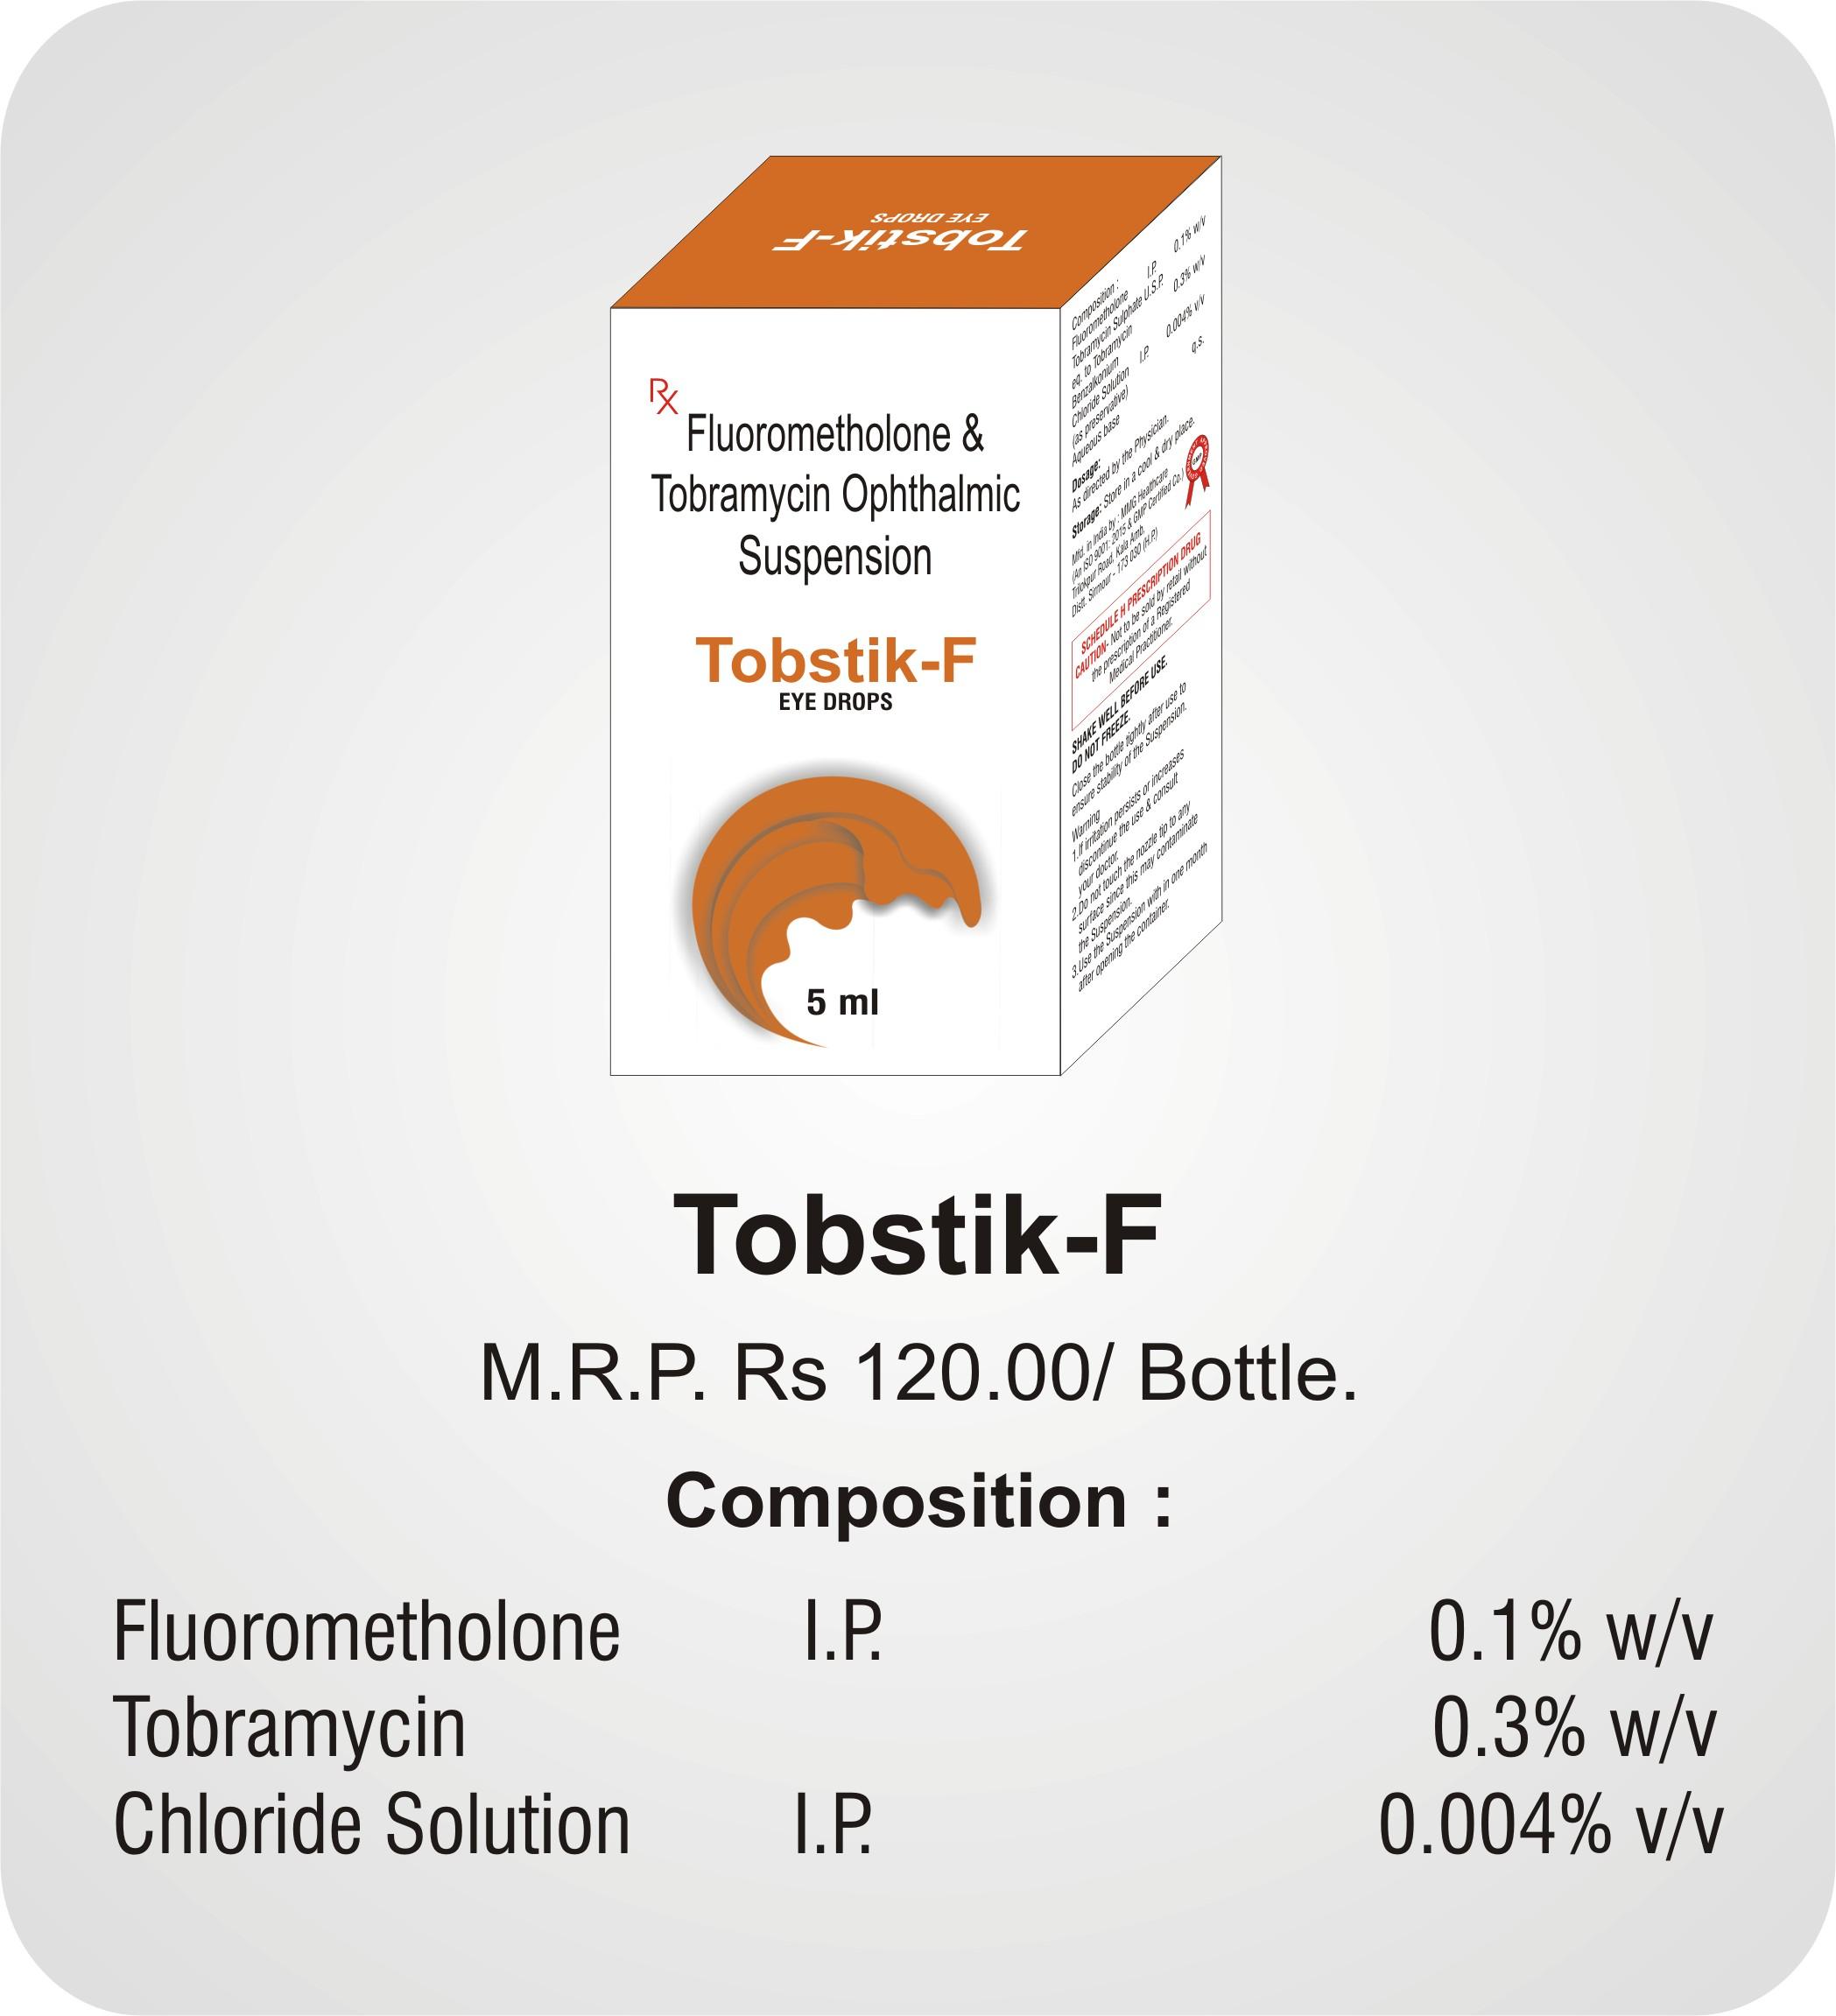 Tobstik-F